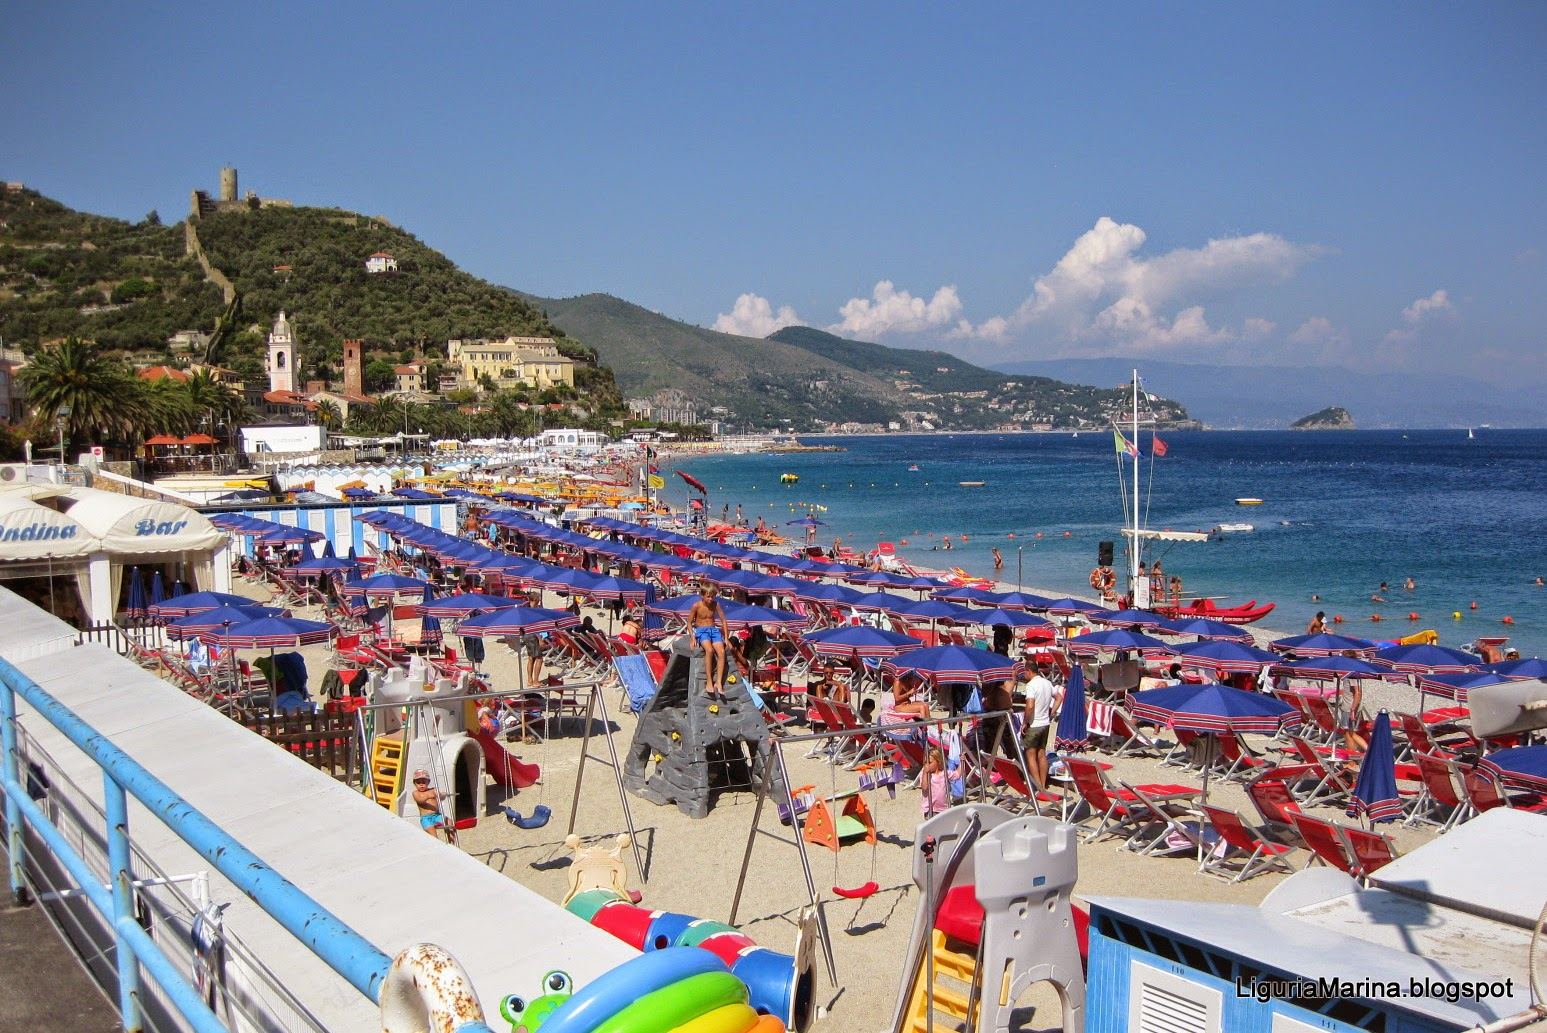 Bagni Blu Beach Vado Ligure : Bagni blu beach vado ligure le migliori idee per la tua design